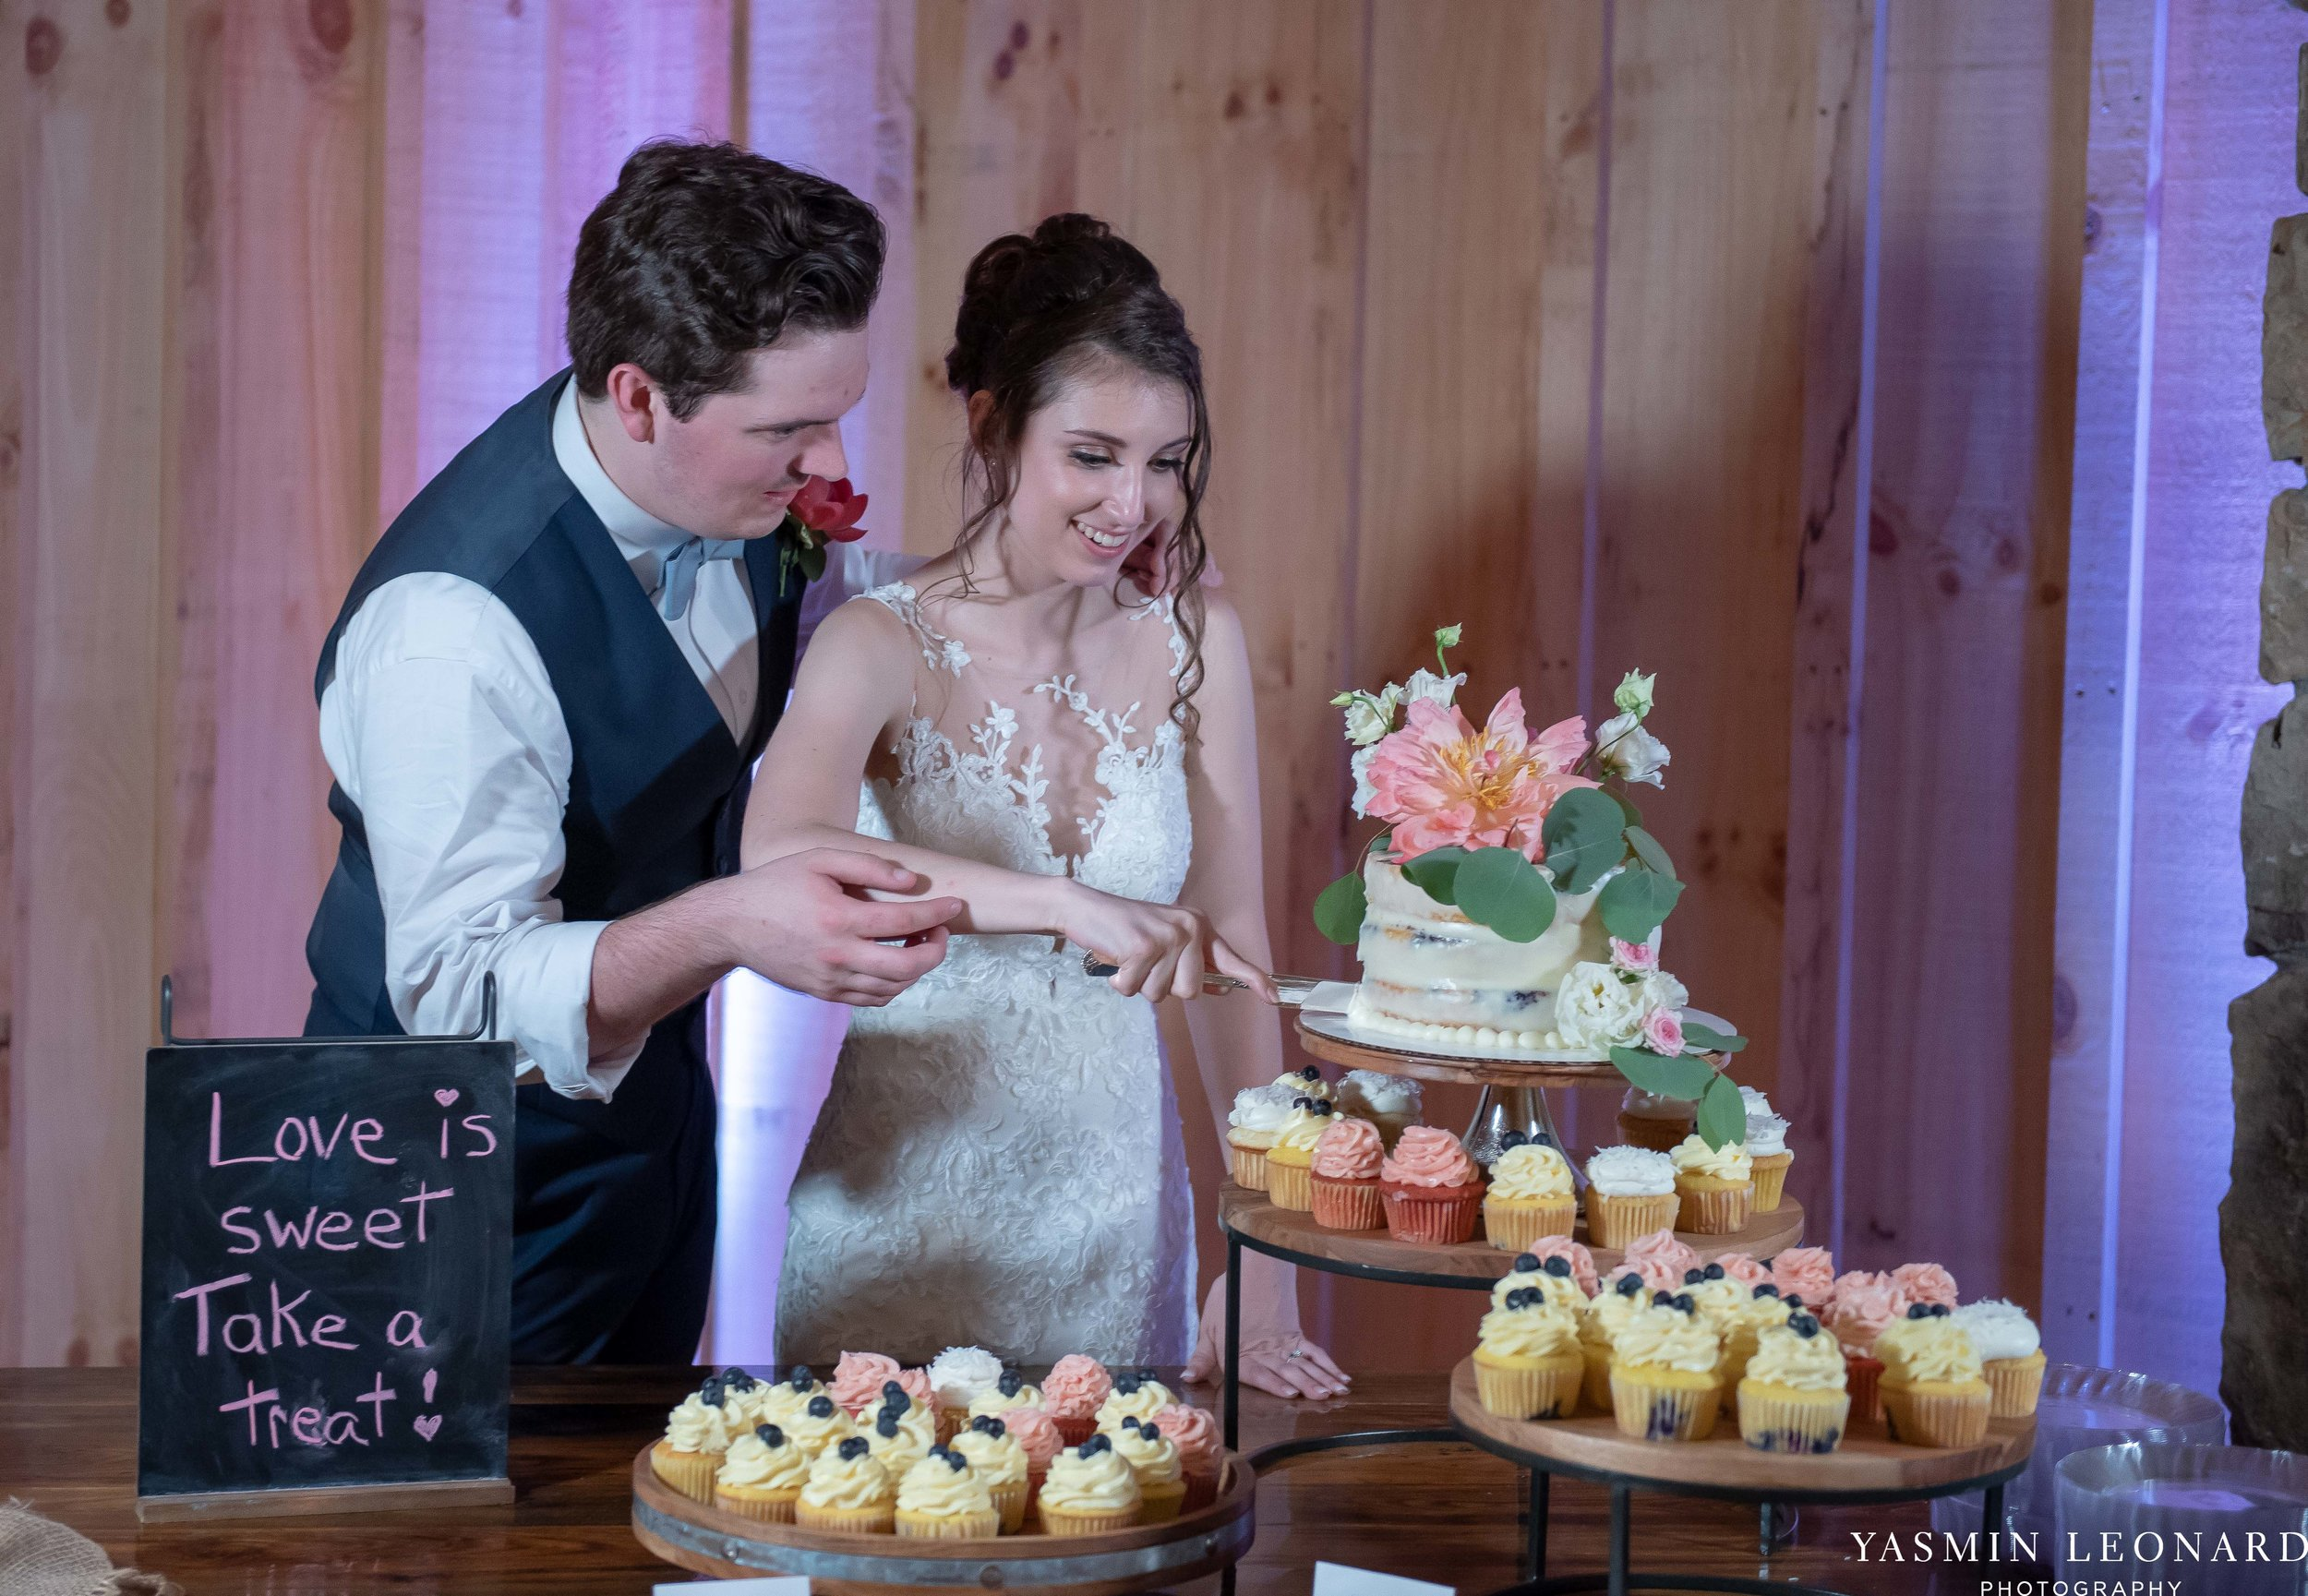 Old Homeplace Vineyard - NC Weddings - Outdoor Summer Weddings - Peony Boutique - Vineyard Wedding - NC Photographer - Yasmin Leonard Photography-64.jpg